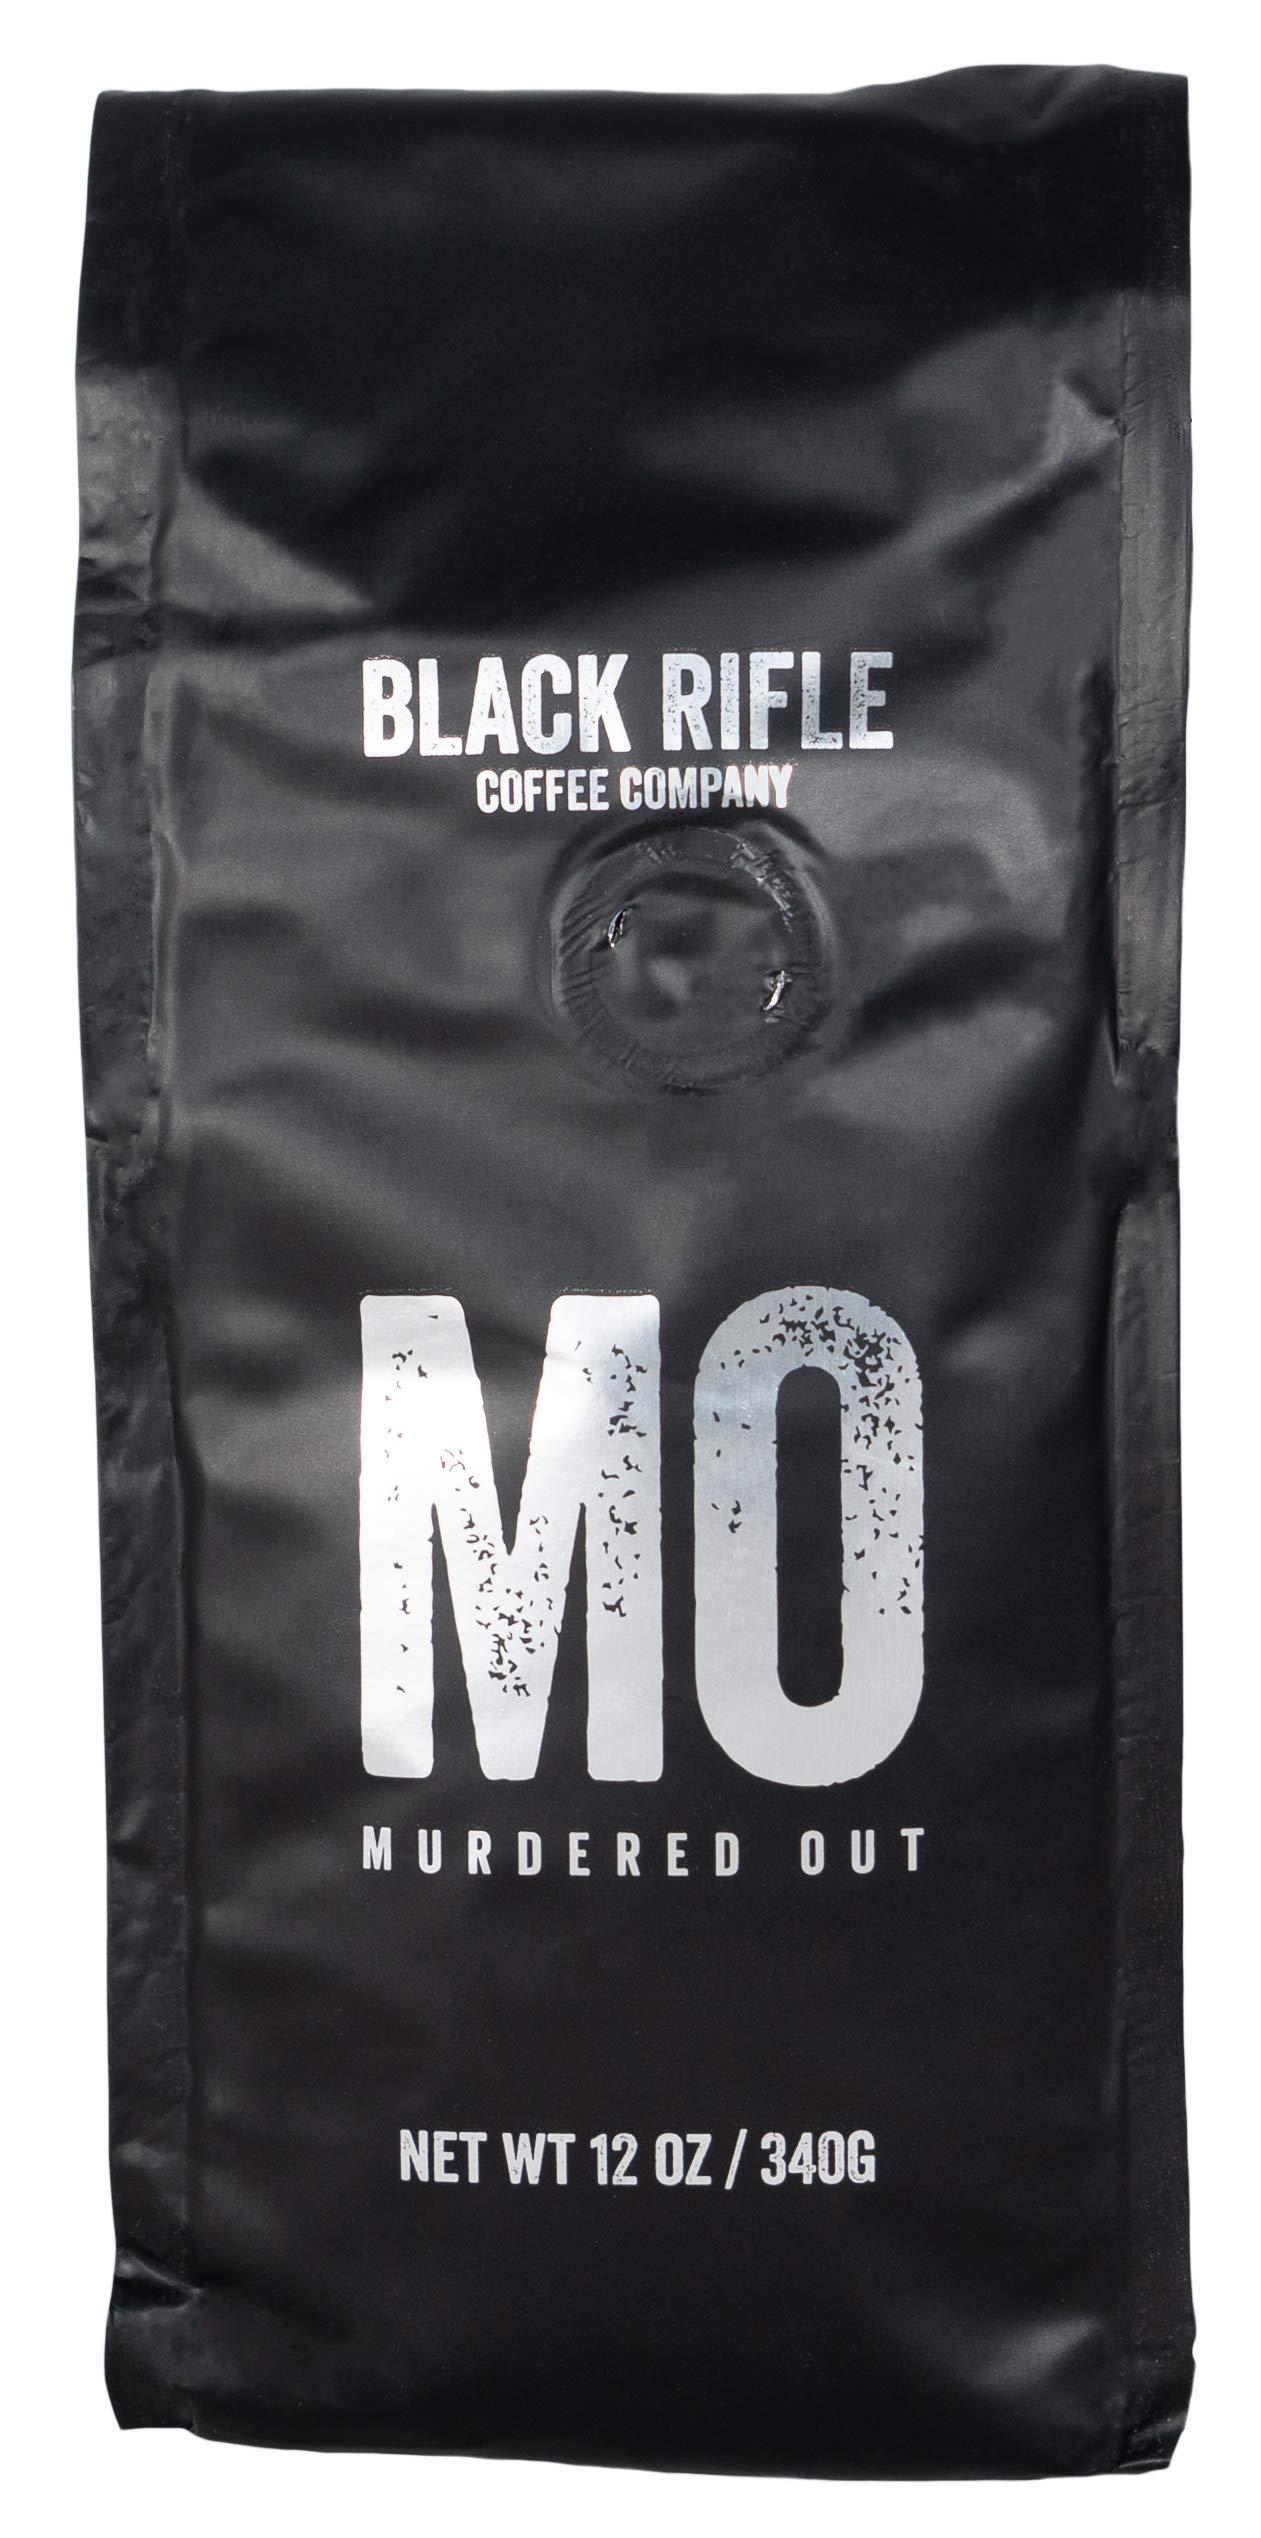 Black Rifle Coffee Company Murdered Out Coffee Dark Roast Ground, 12 Ounce Bag by Black Rifle Coffee Company (Image #2)